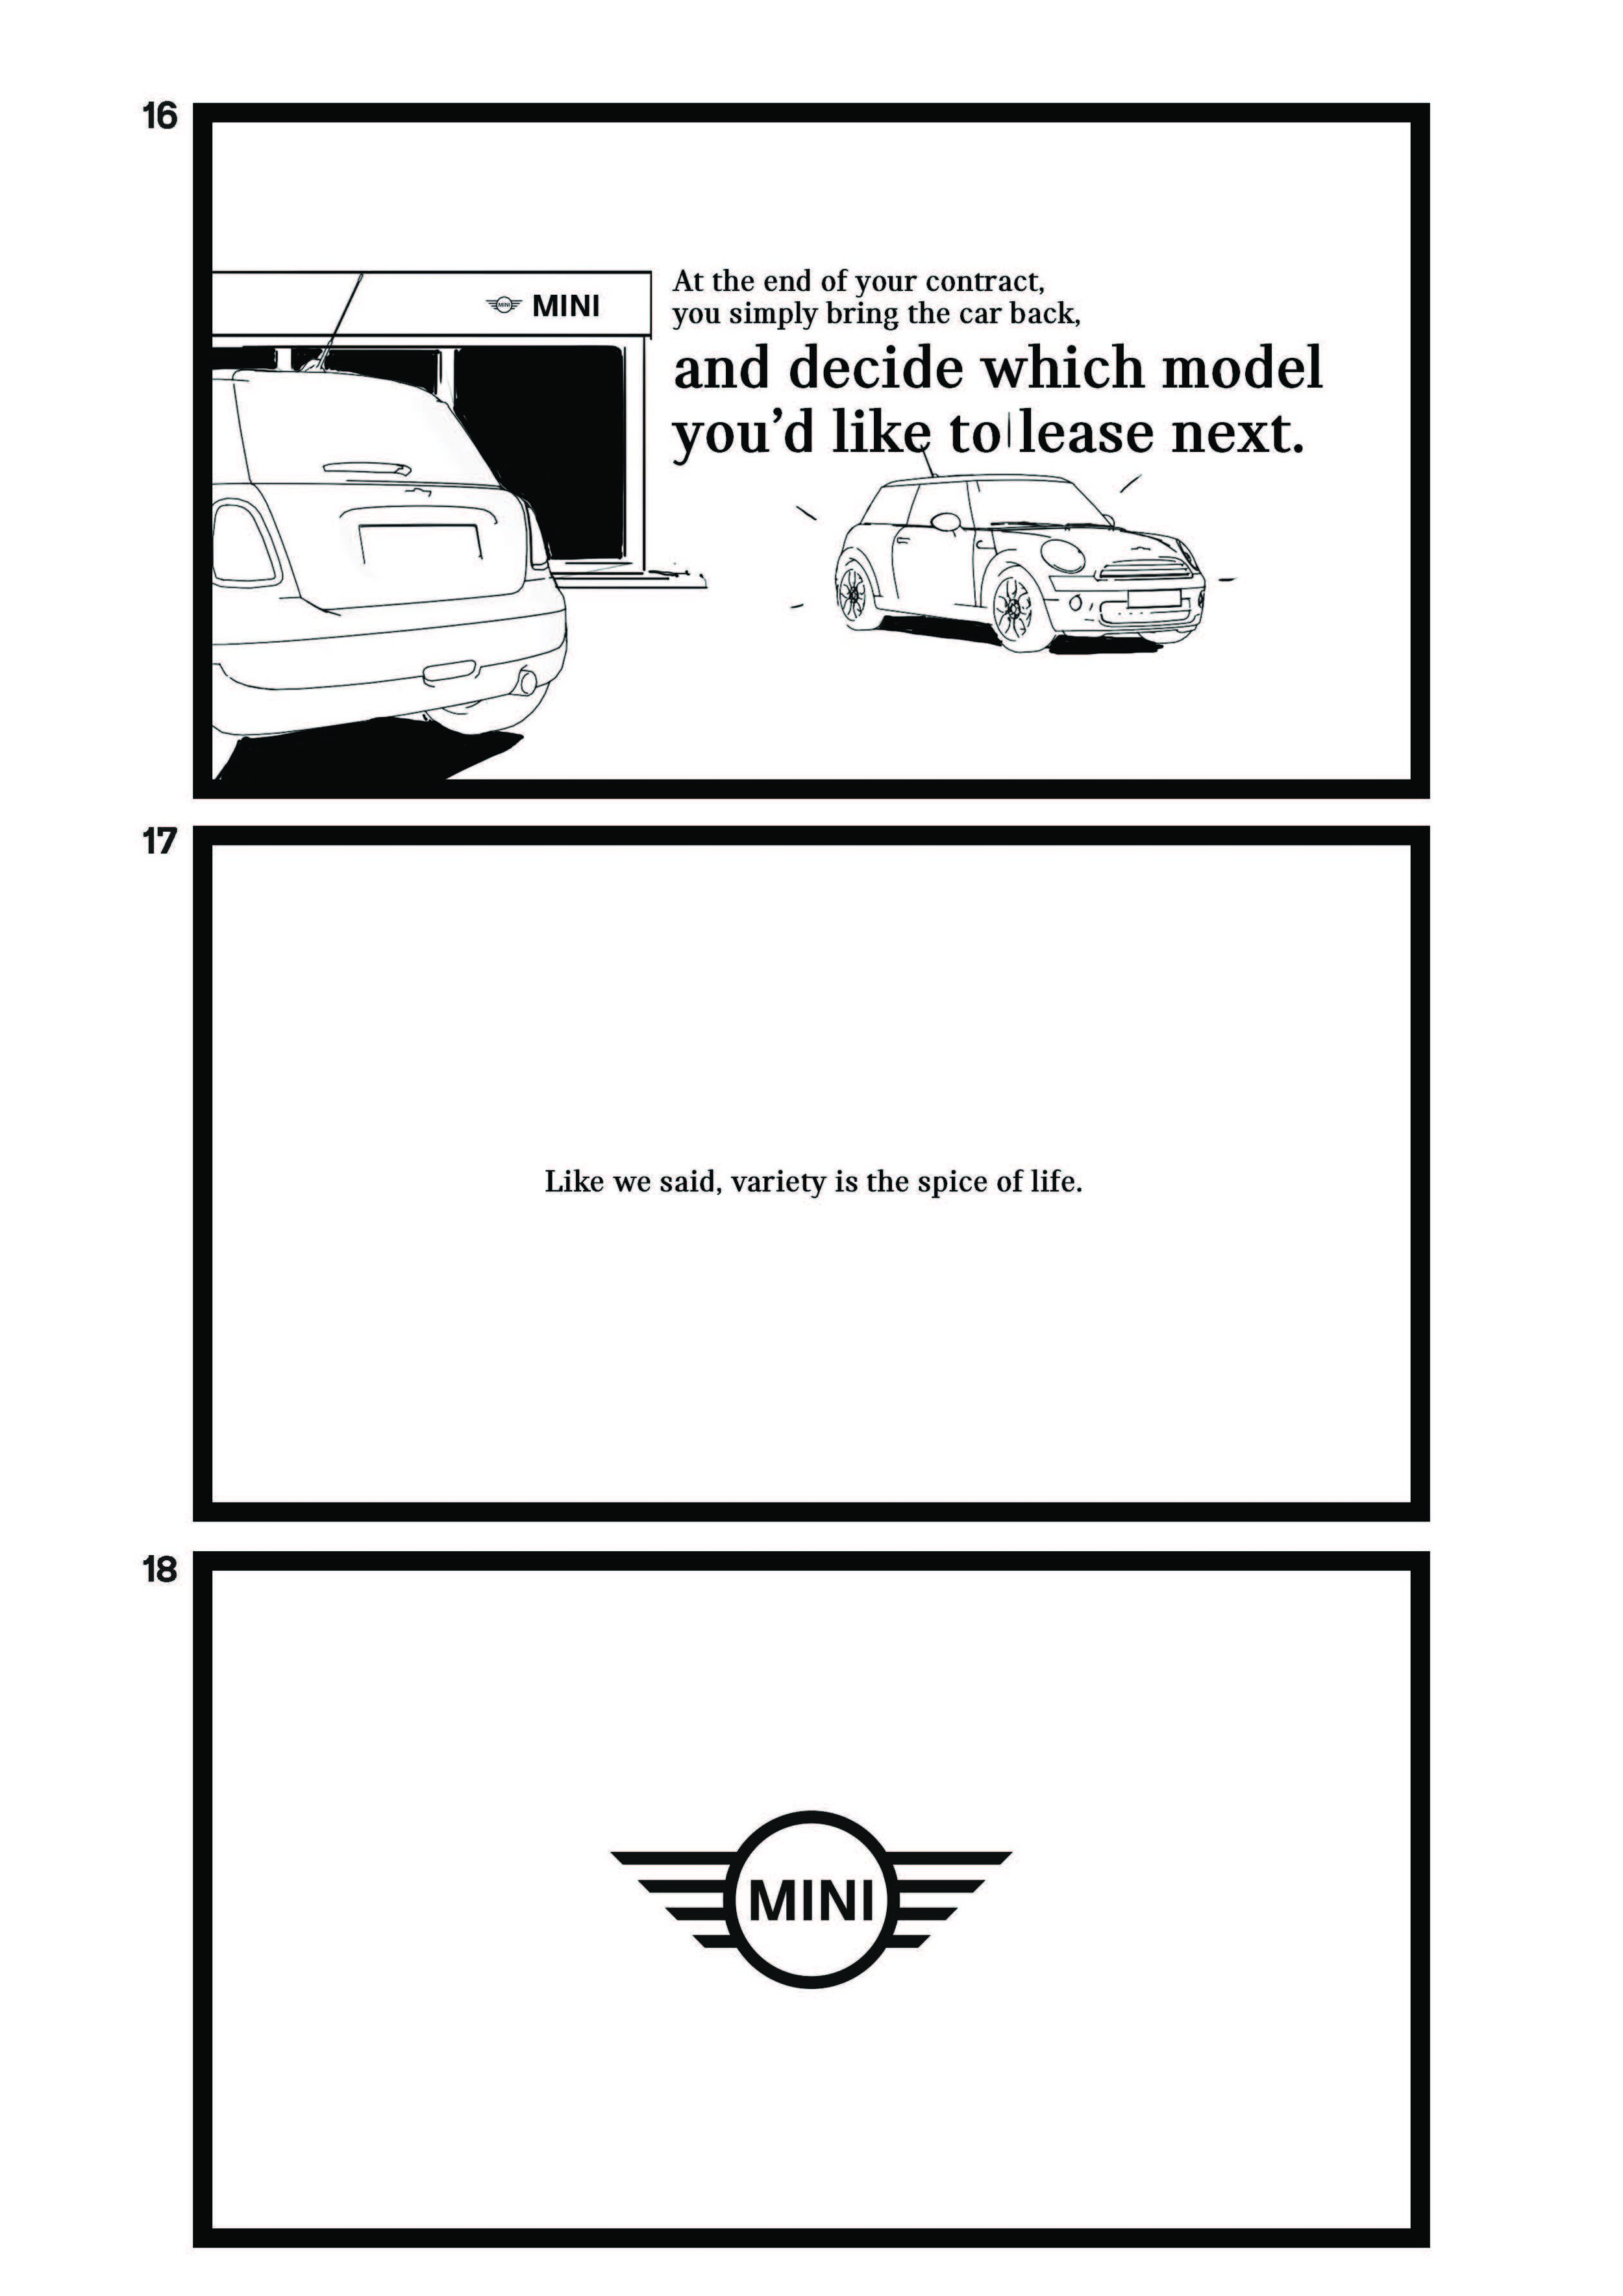 Storyboard_MINI_leasing_v4_final_Page_8.jpg